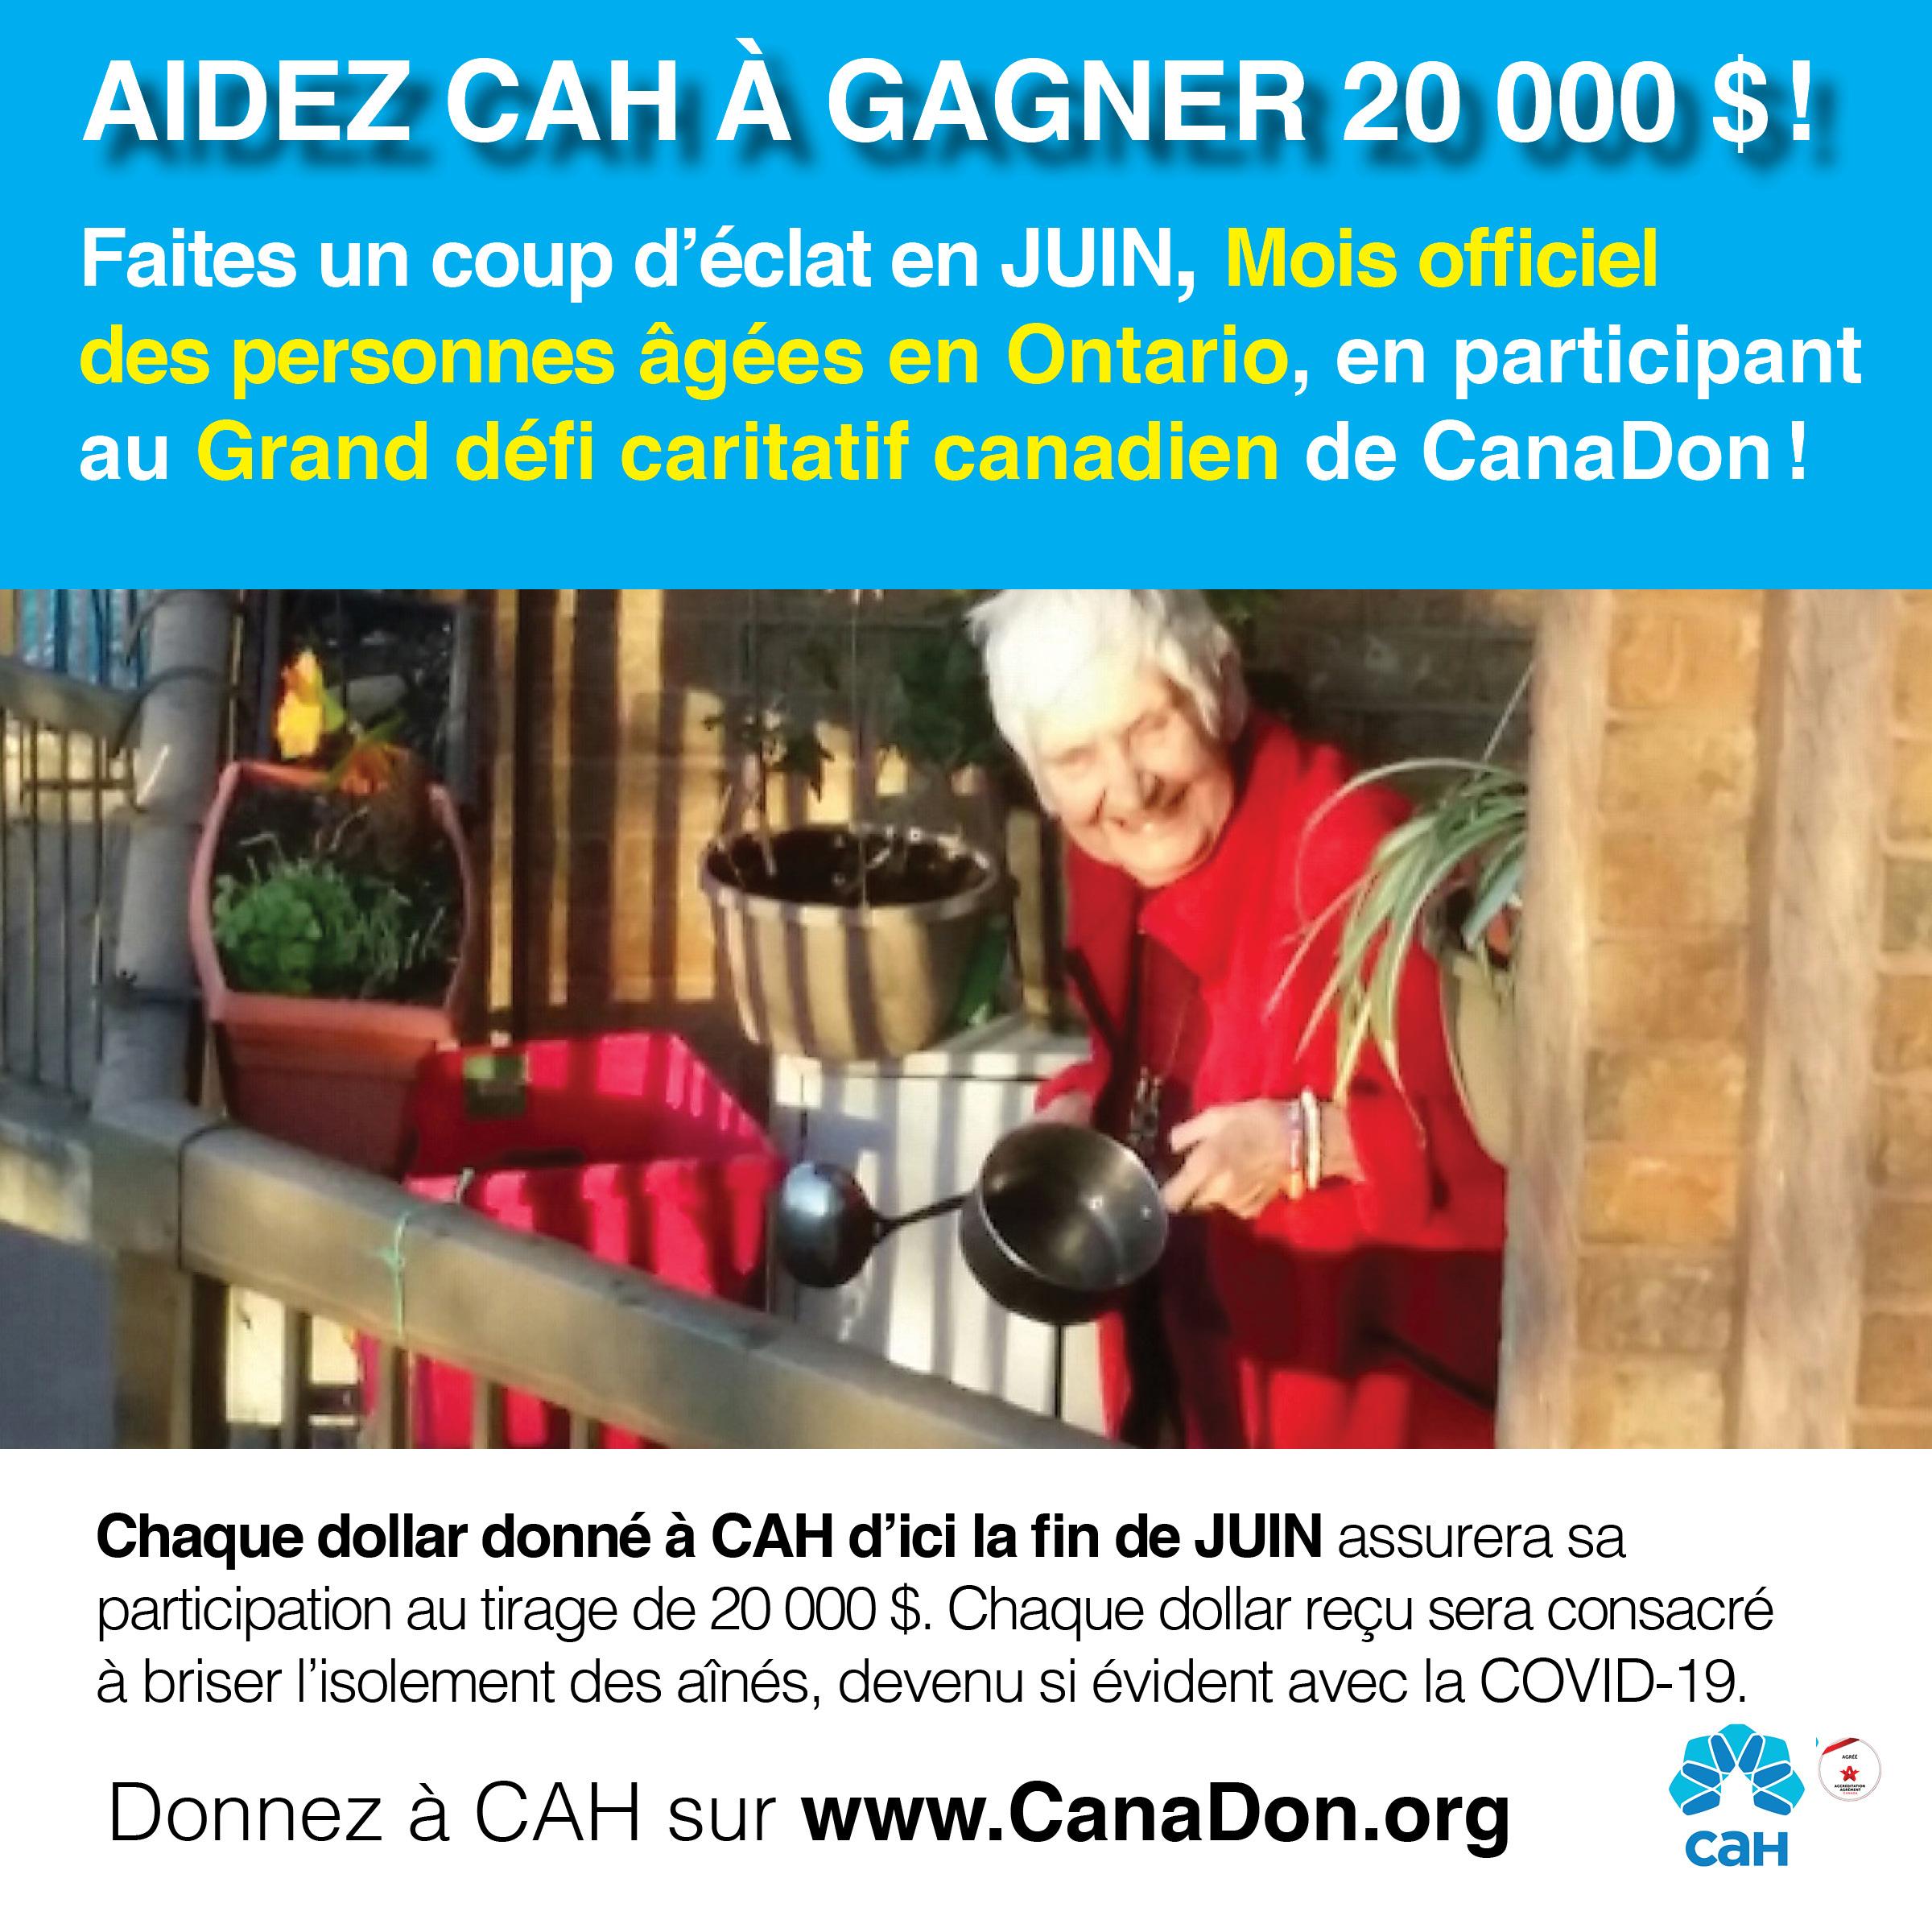 Le grand défi CARITATIF canadien de CanaDon.org